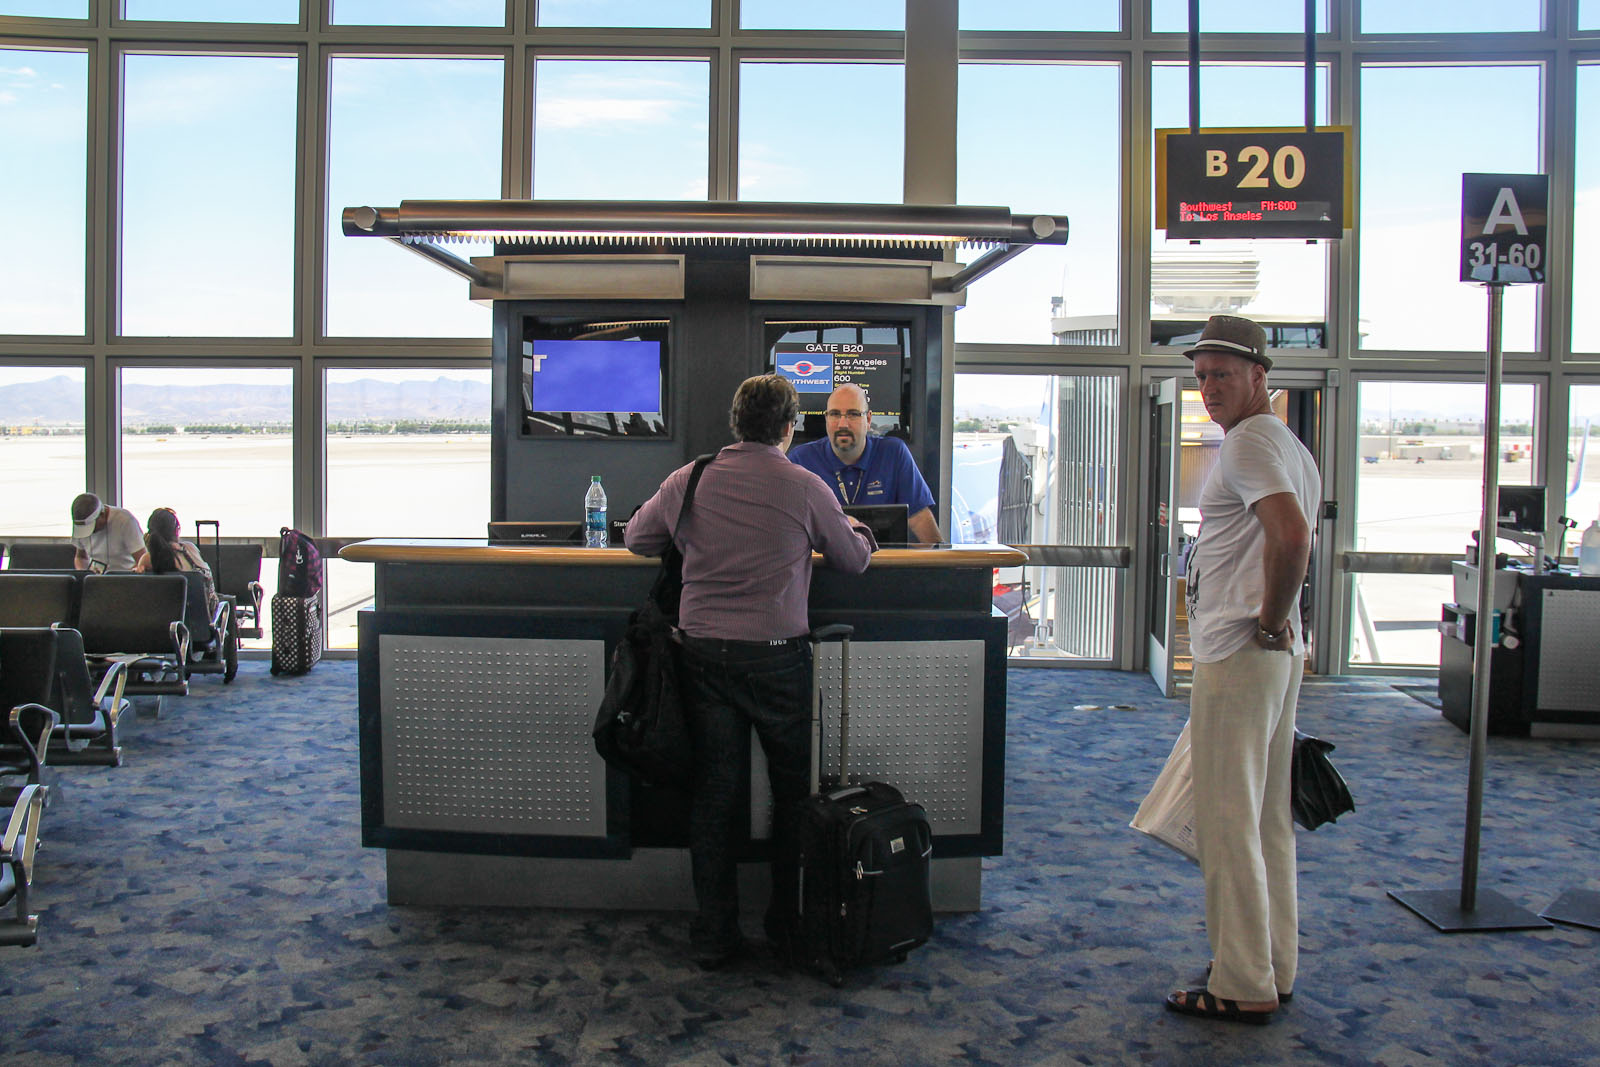 Выход на посадку в аэропорту Лас-Вегаса